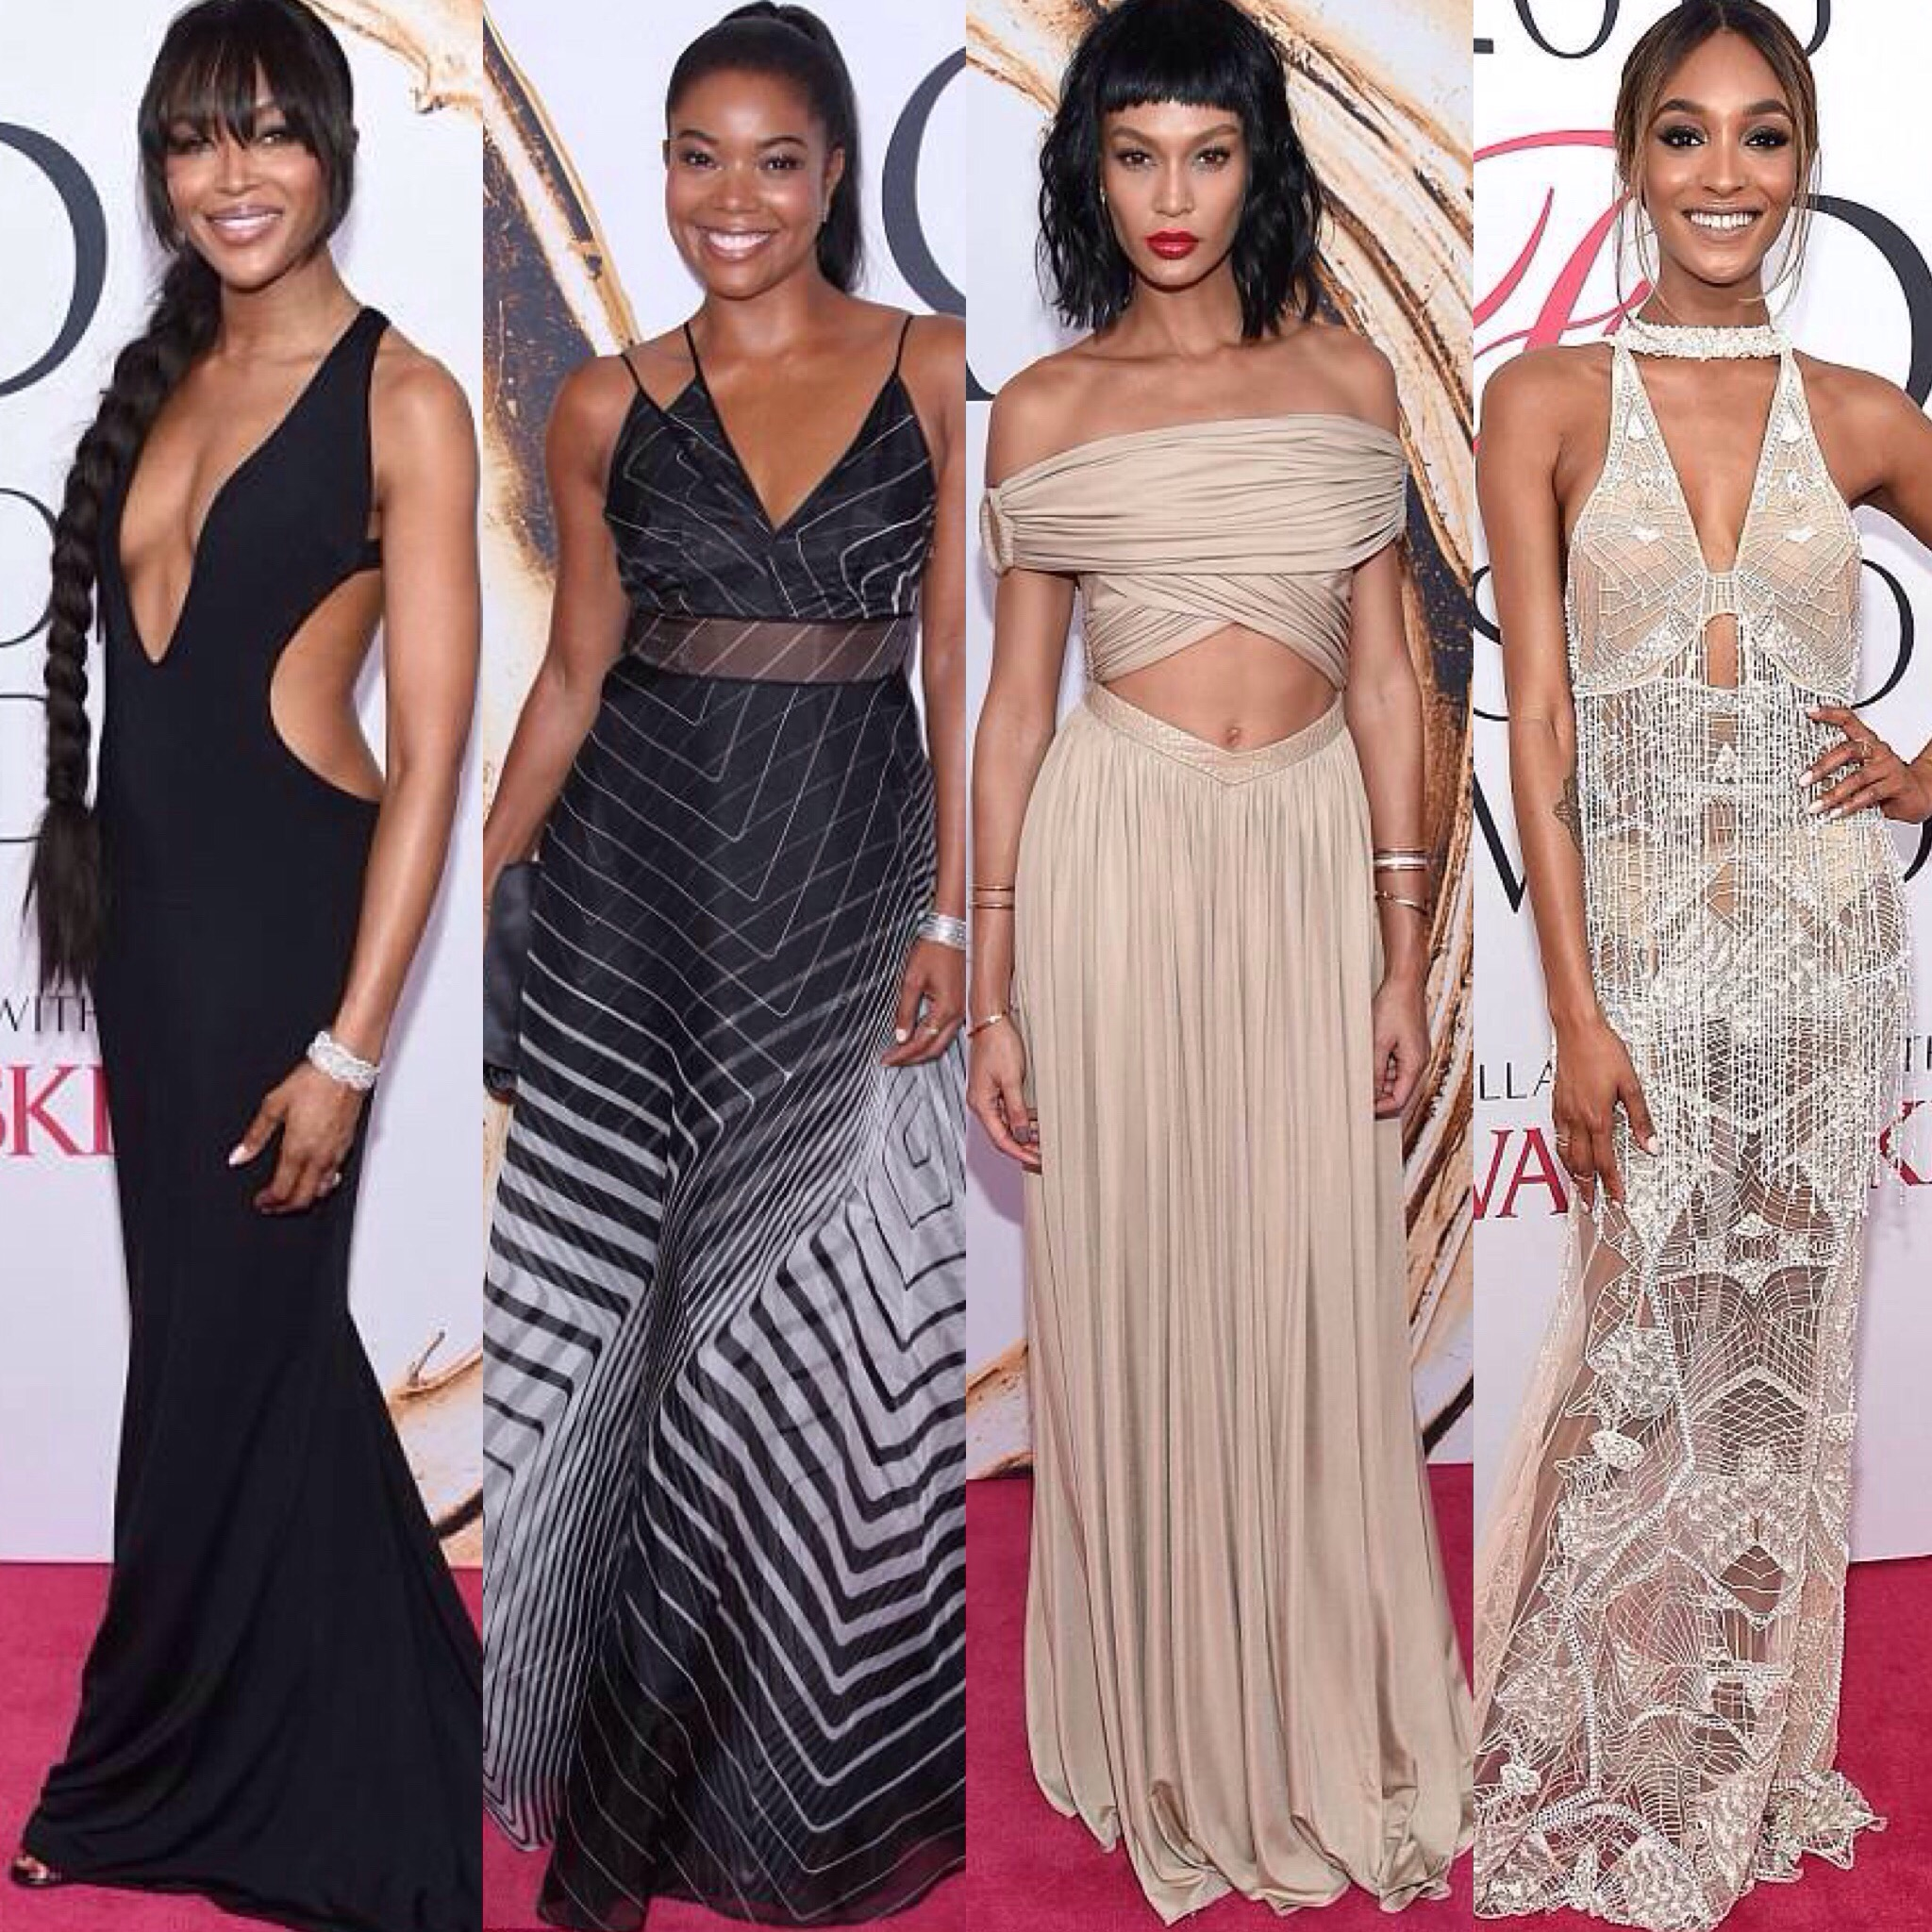 Naomi Campbell, Gabrielle Union, Joan Small,  Jourdan Dunn at the CFDA Awards 2016